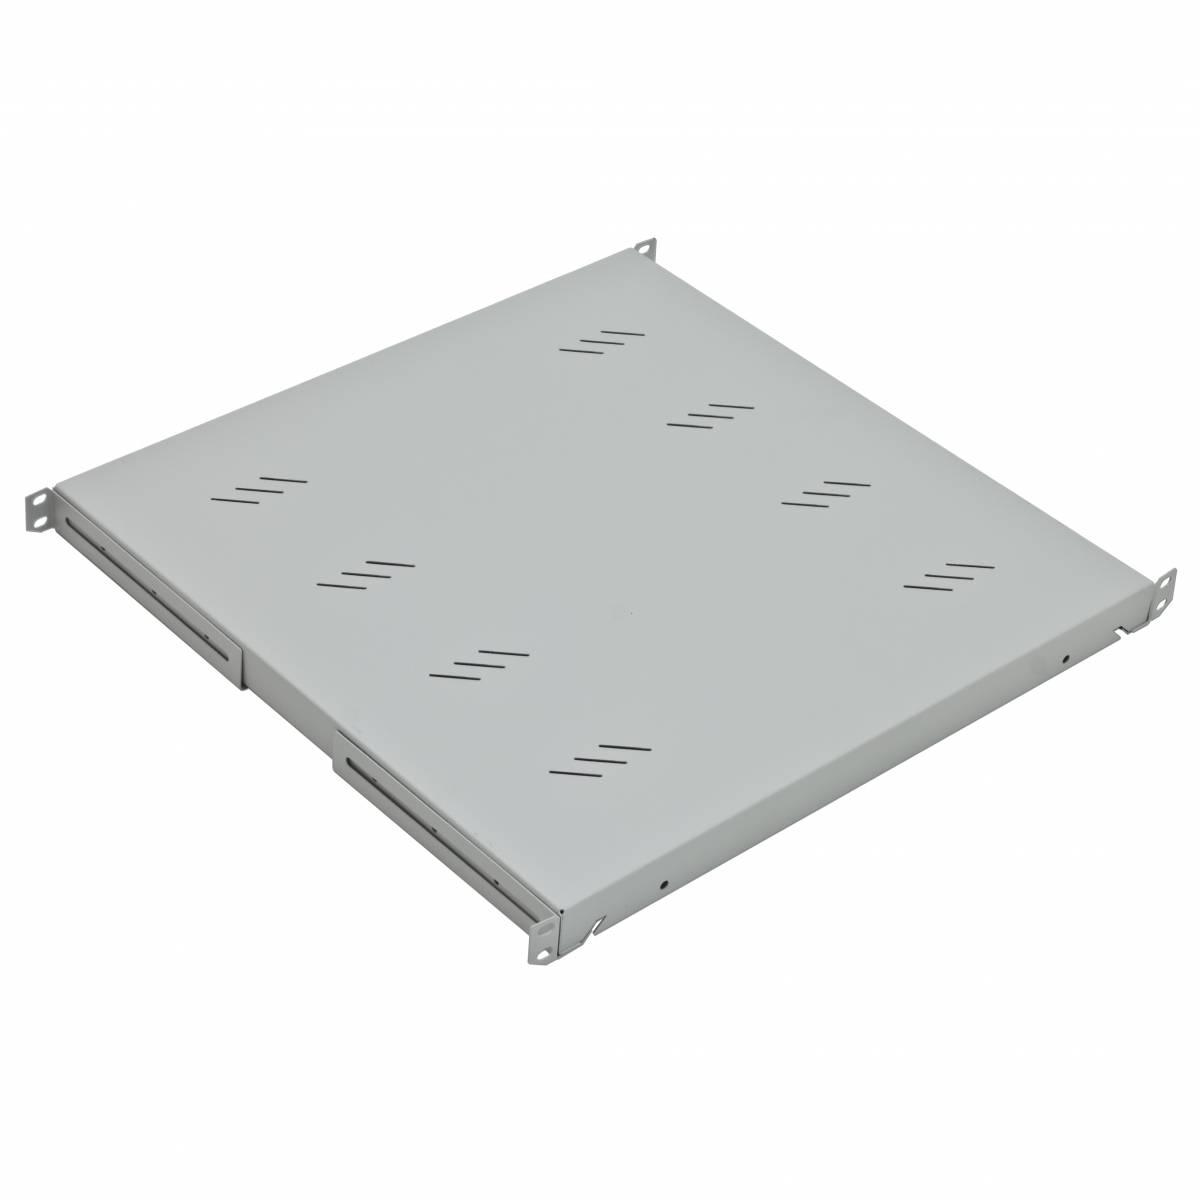 "19"" Shelf Fix, up to 80kg Load, D=550mm, 1U, RAL7035"